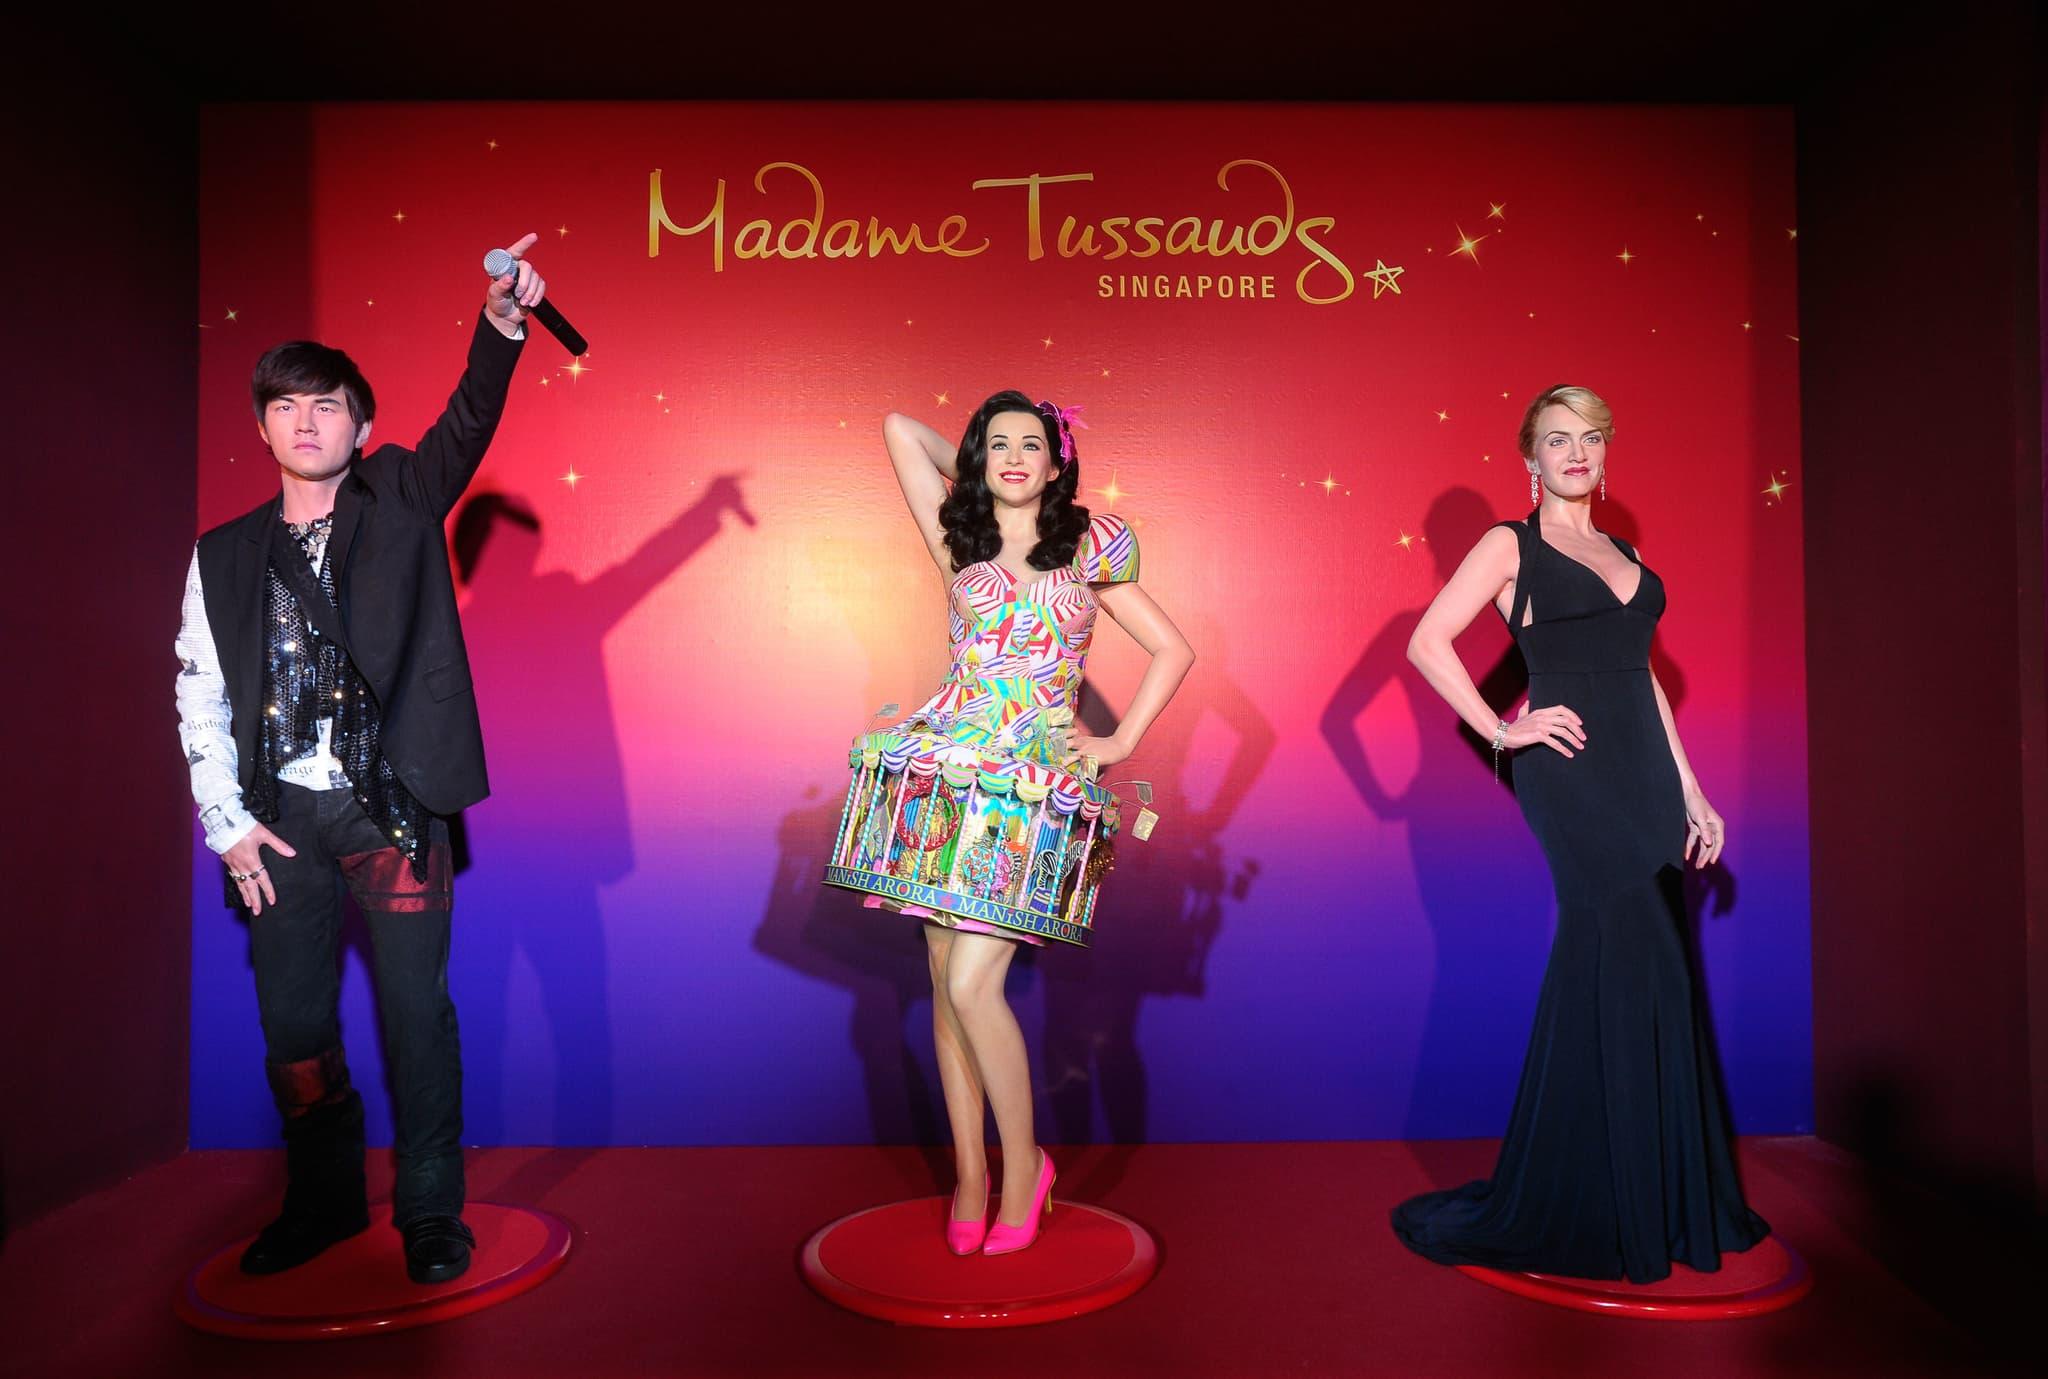 Madame Tussauds Singapore - Background